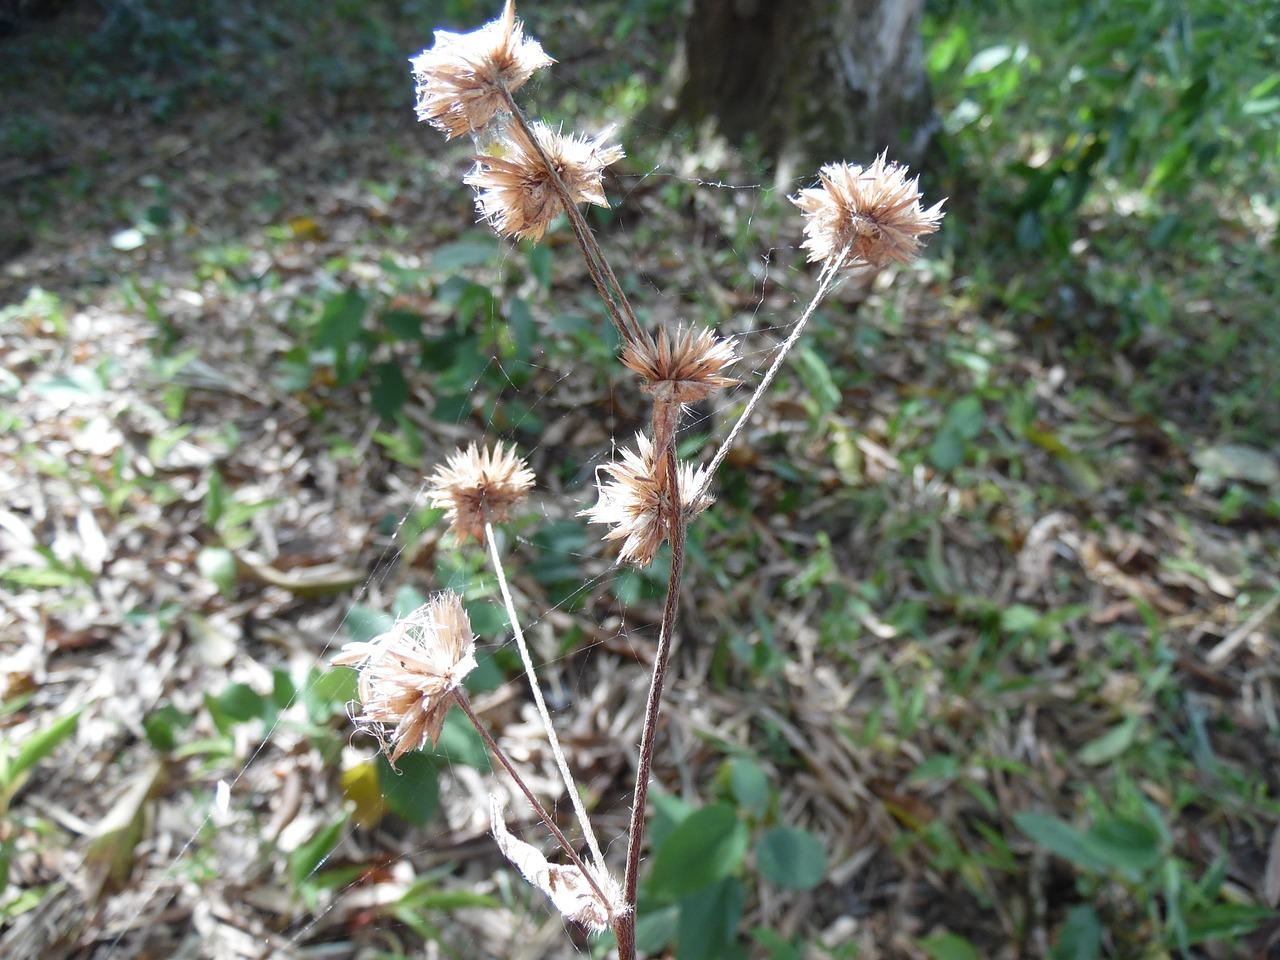 Flowernaturespringsummerplant Free Photo From Needpix